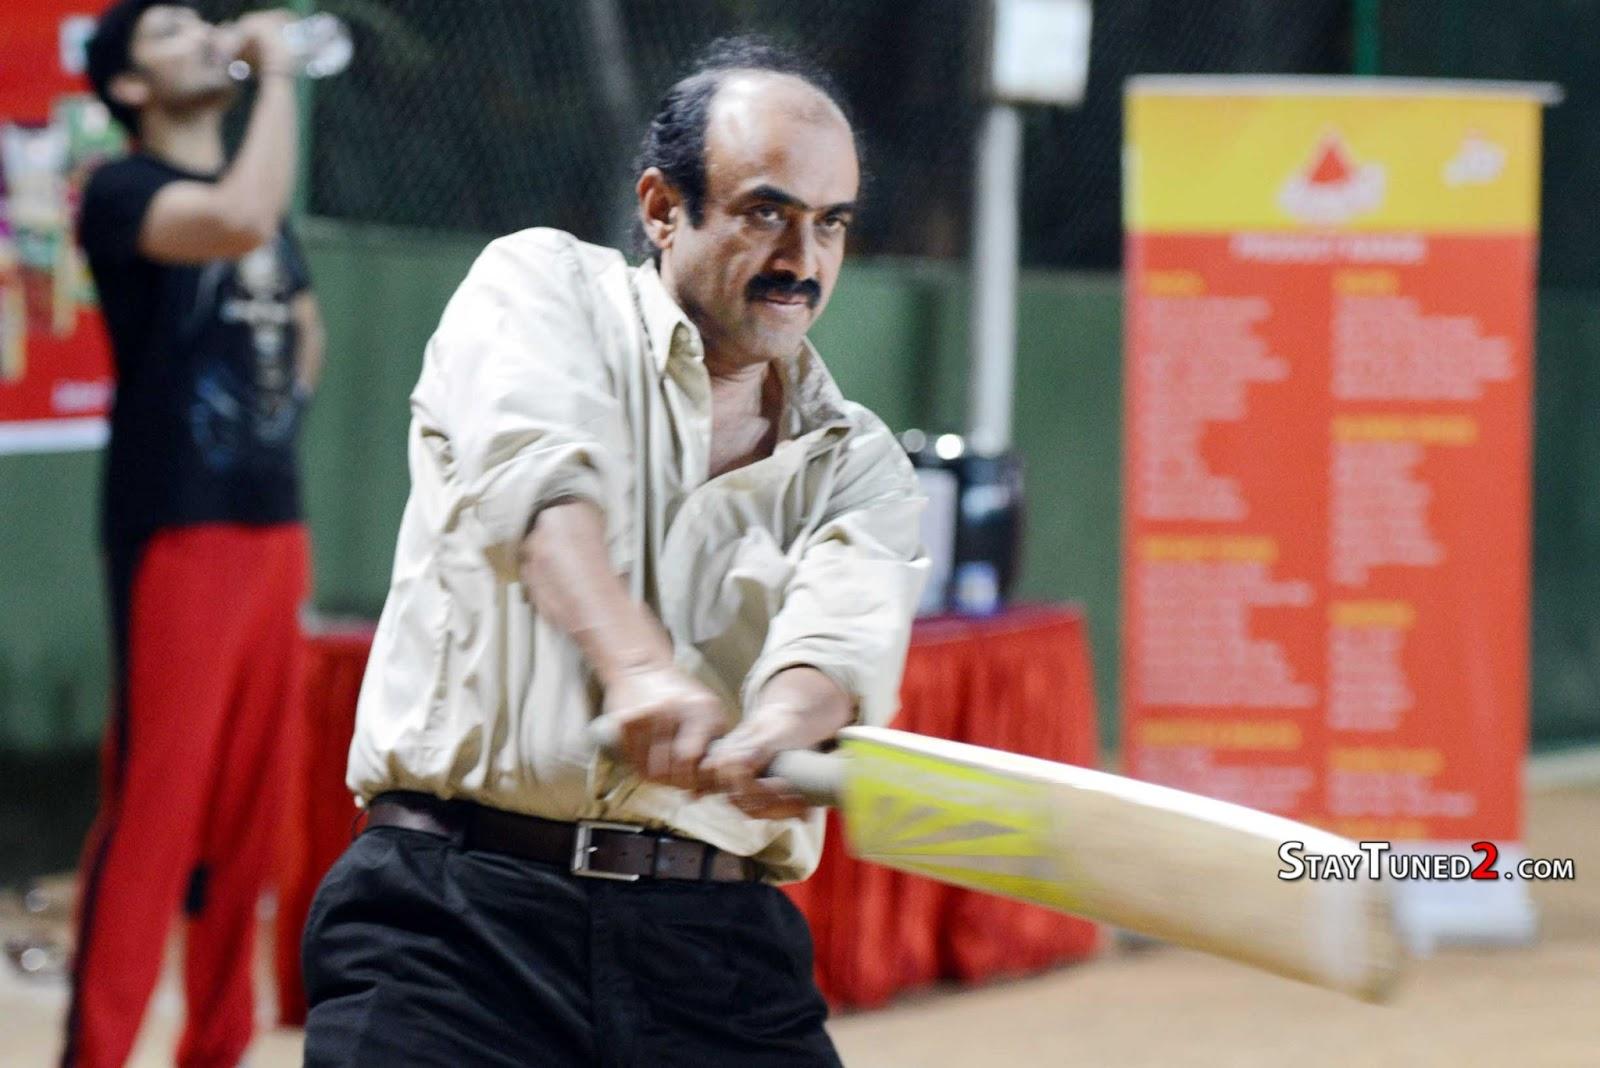 http://1.bp.blogspot.com/-OjmWXThkoAw/URNOFOwFKBI/AAAAAAAAFVY/jilE-zlYVcs/s1600/Telugu-Warriors-Practicing-For-CCL-3-At-In-Sportz-Stadium-64.jpg